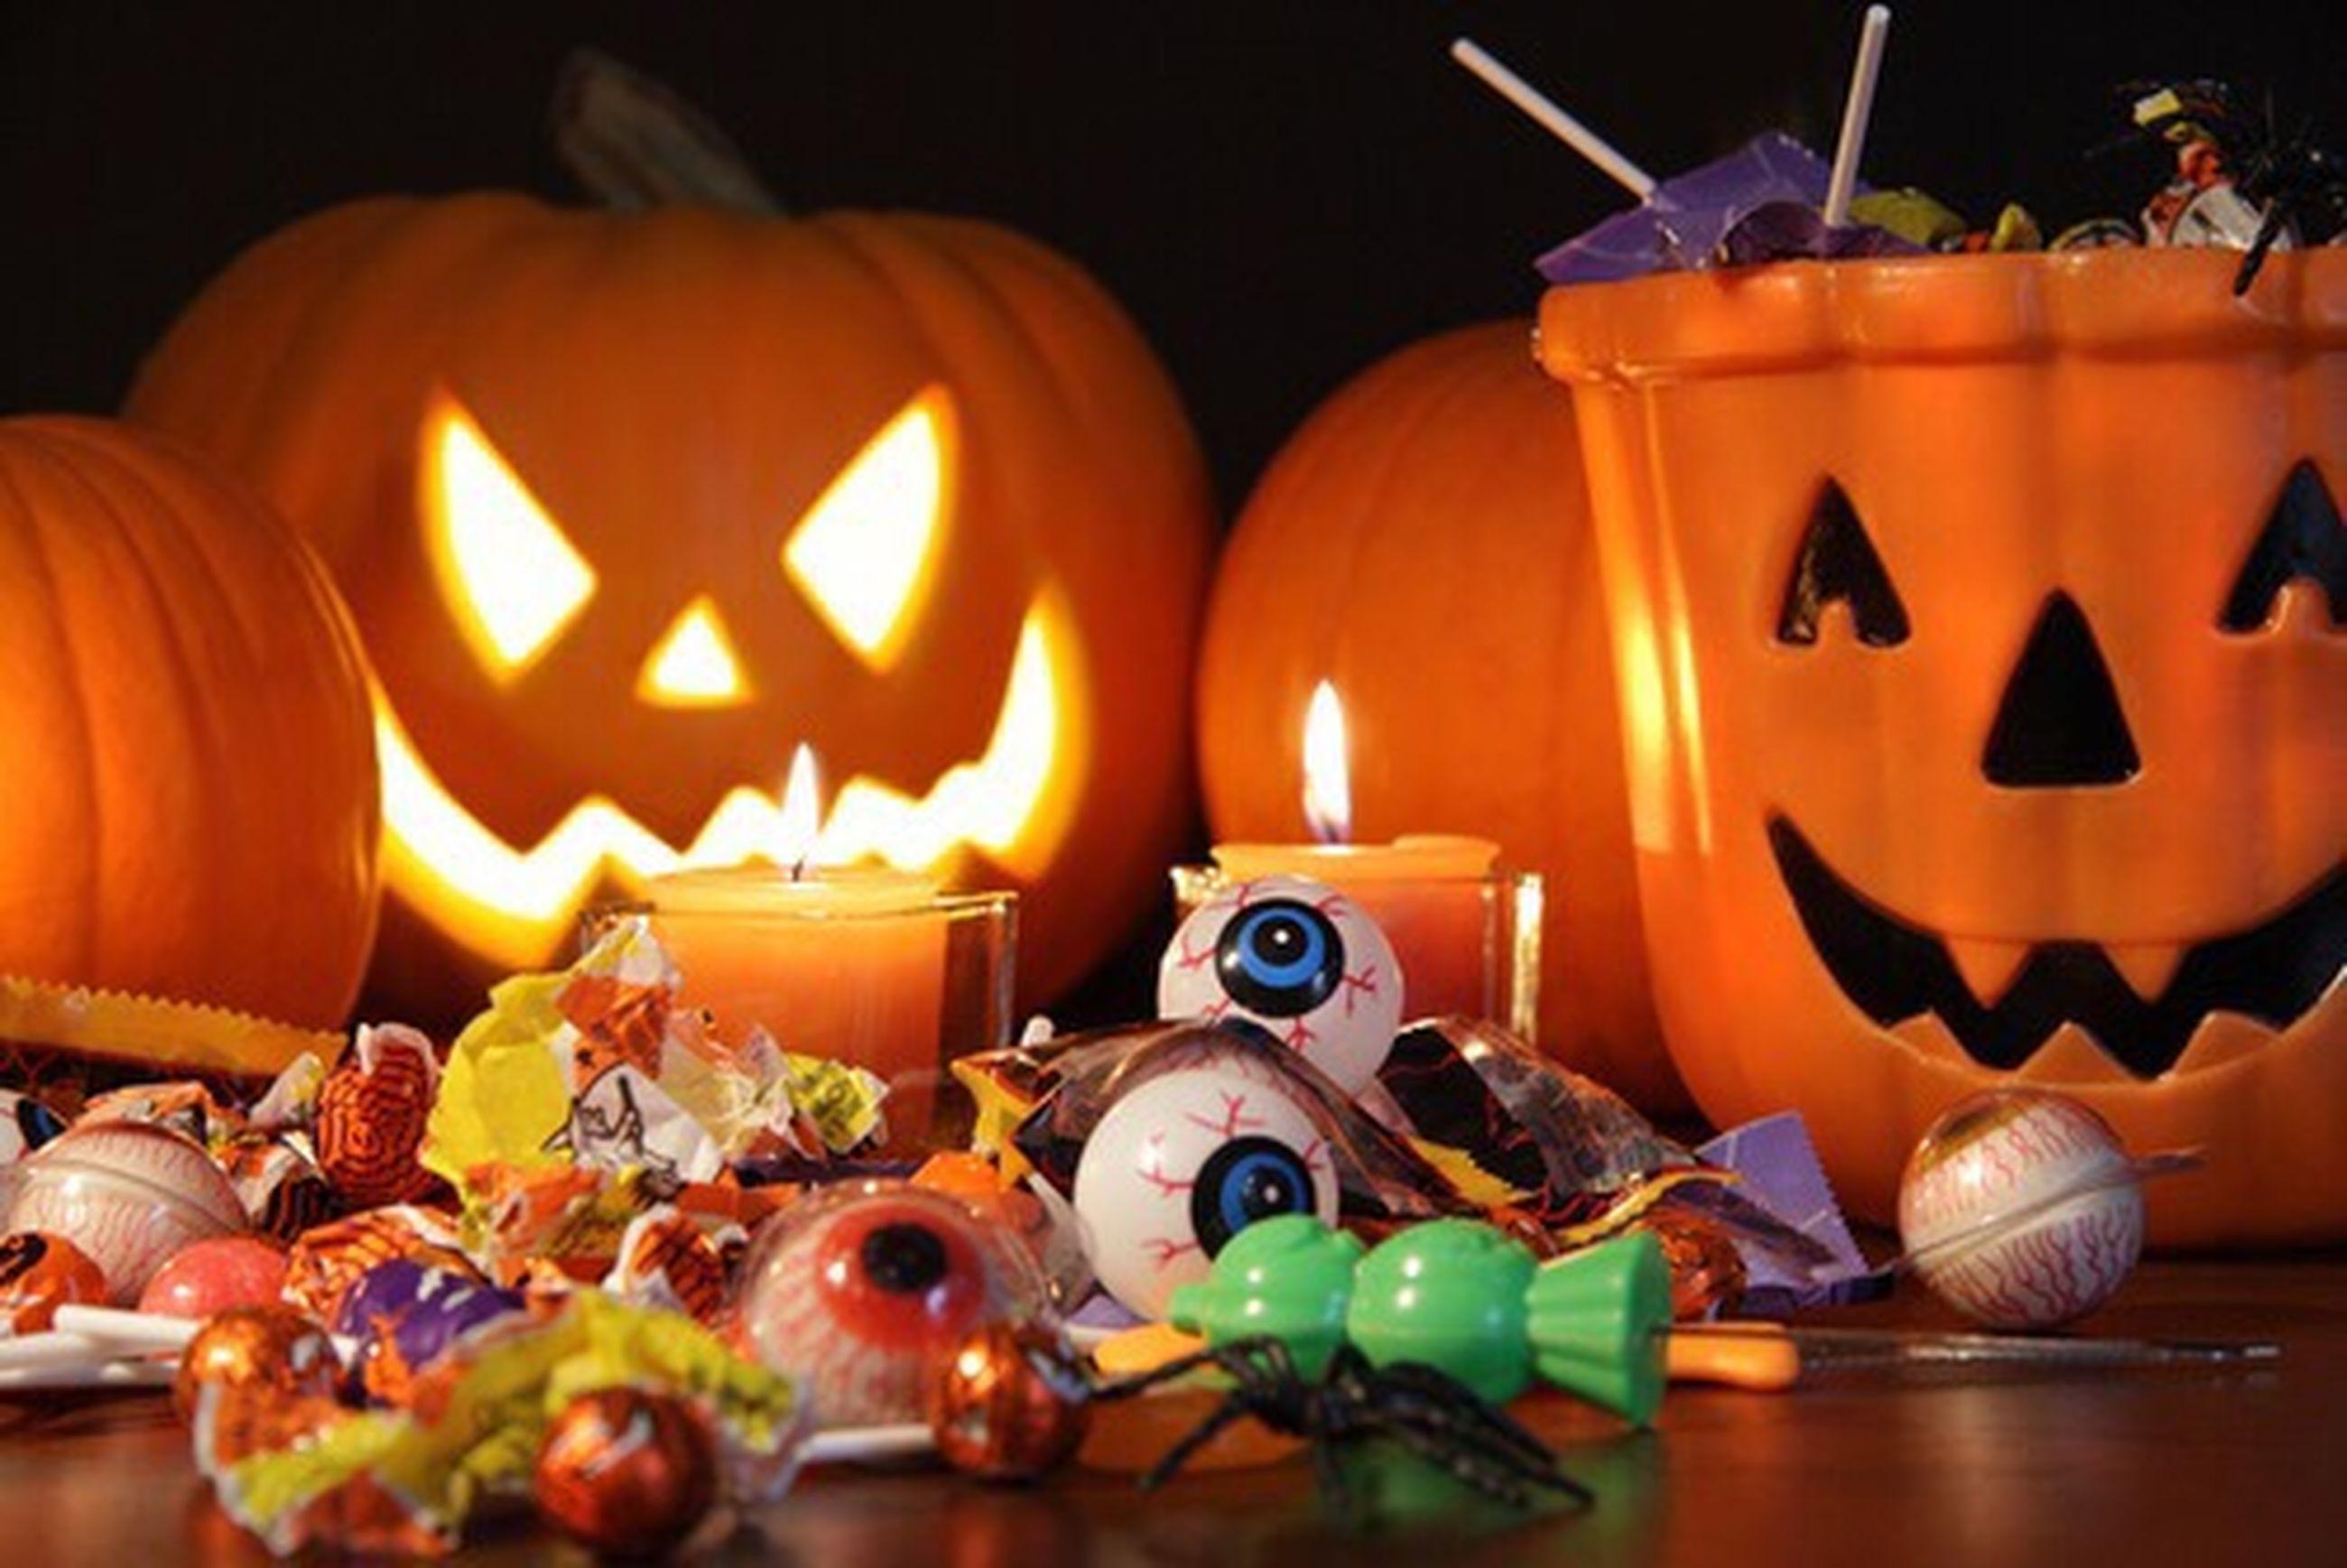 indoors, pumpkin, flame, illuminated, still life, close-up, art and craft, human representation, candle, halloween, art, burning, creativity, orange color, decoration, food, night, no people, tradition